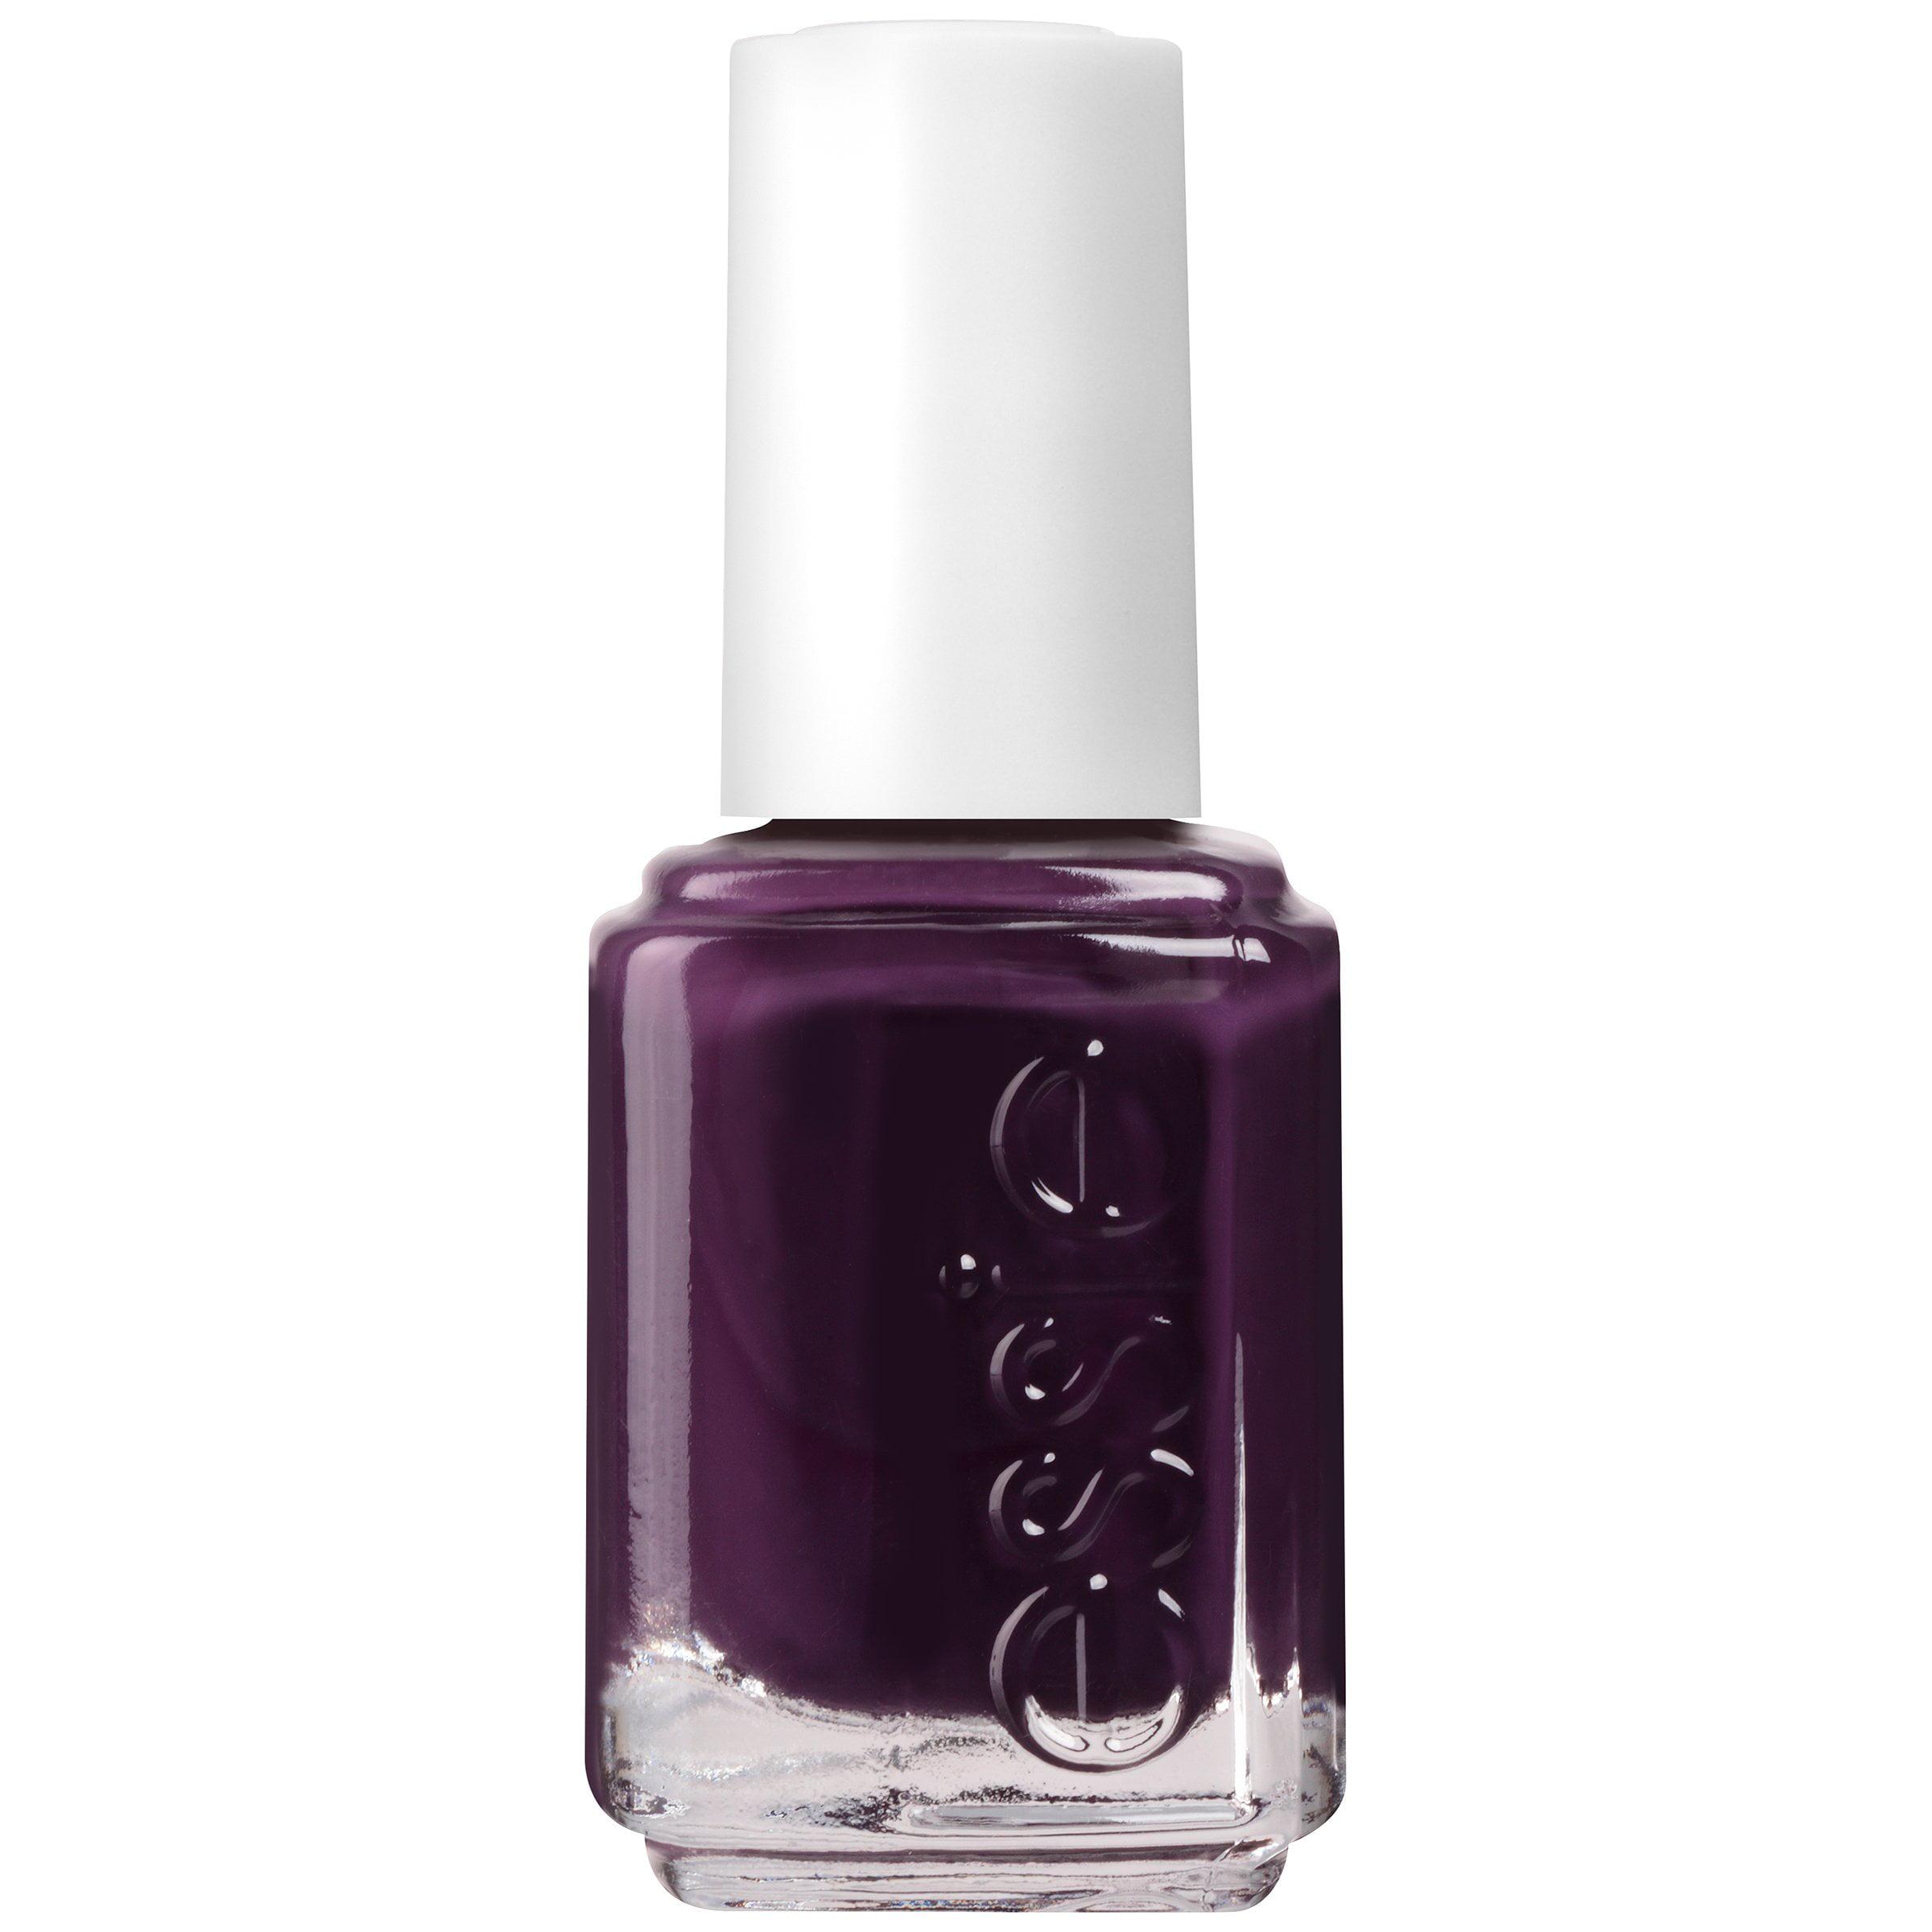 Essie Nail Polish (Plums) Lilacism, 0.46 fl oz - Walmart.com